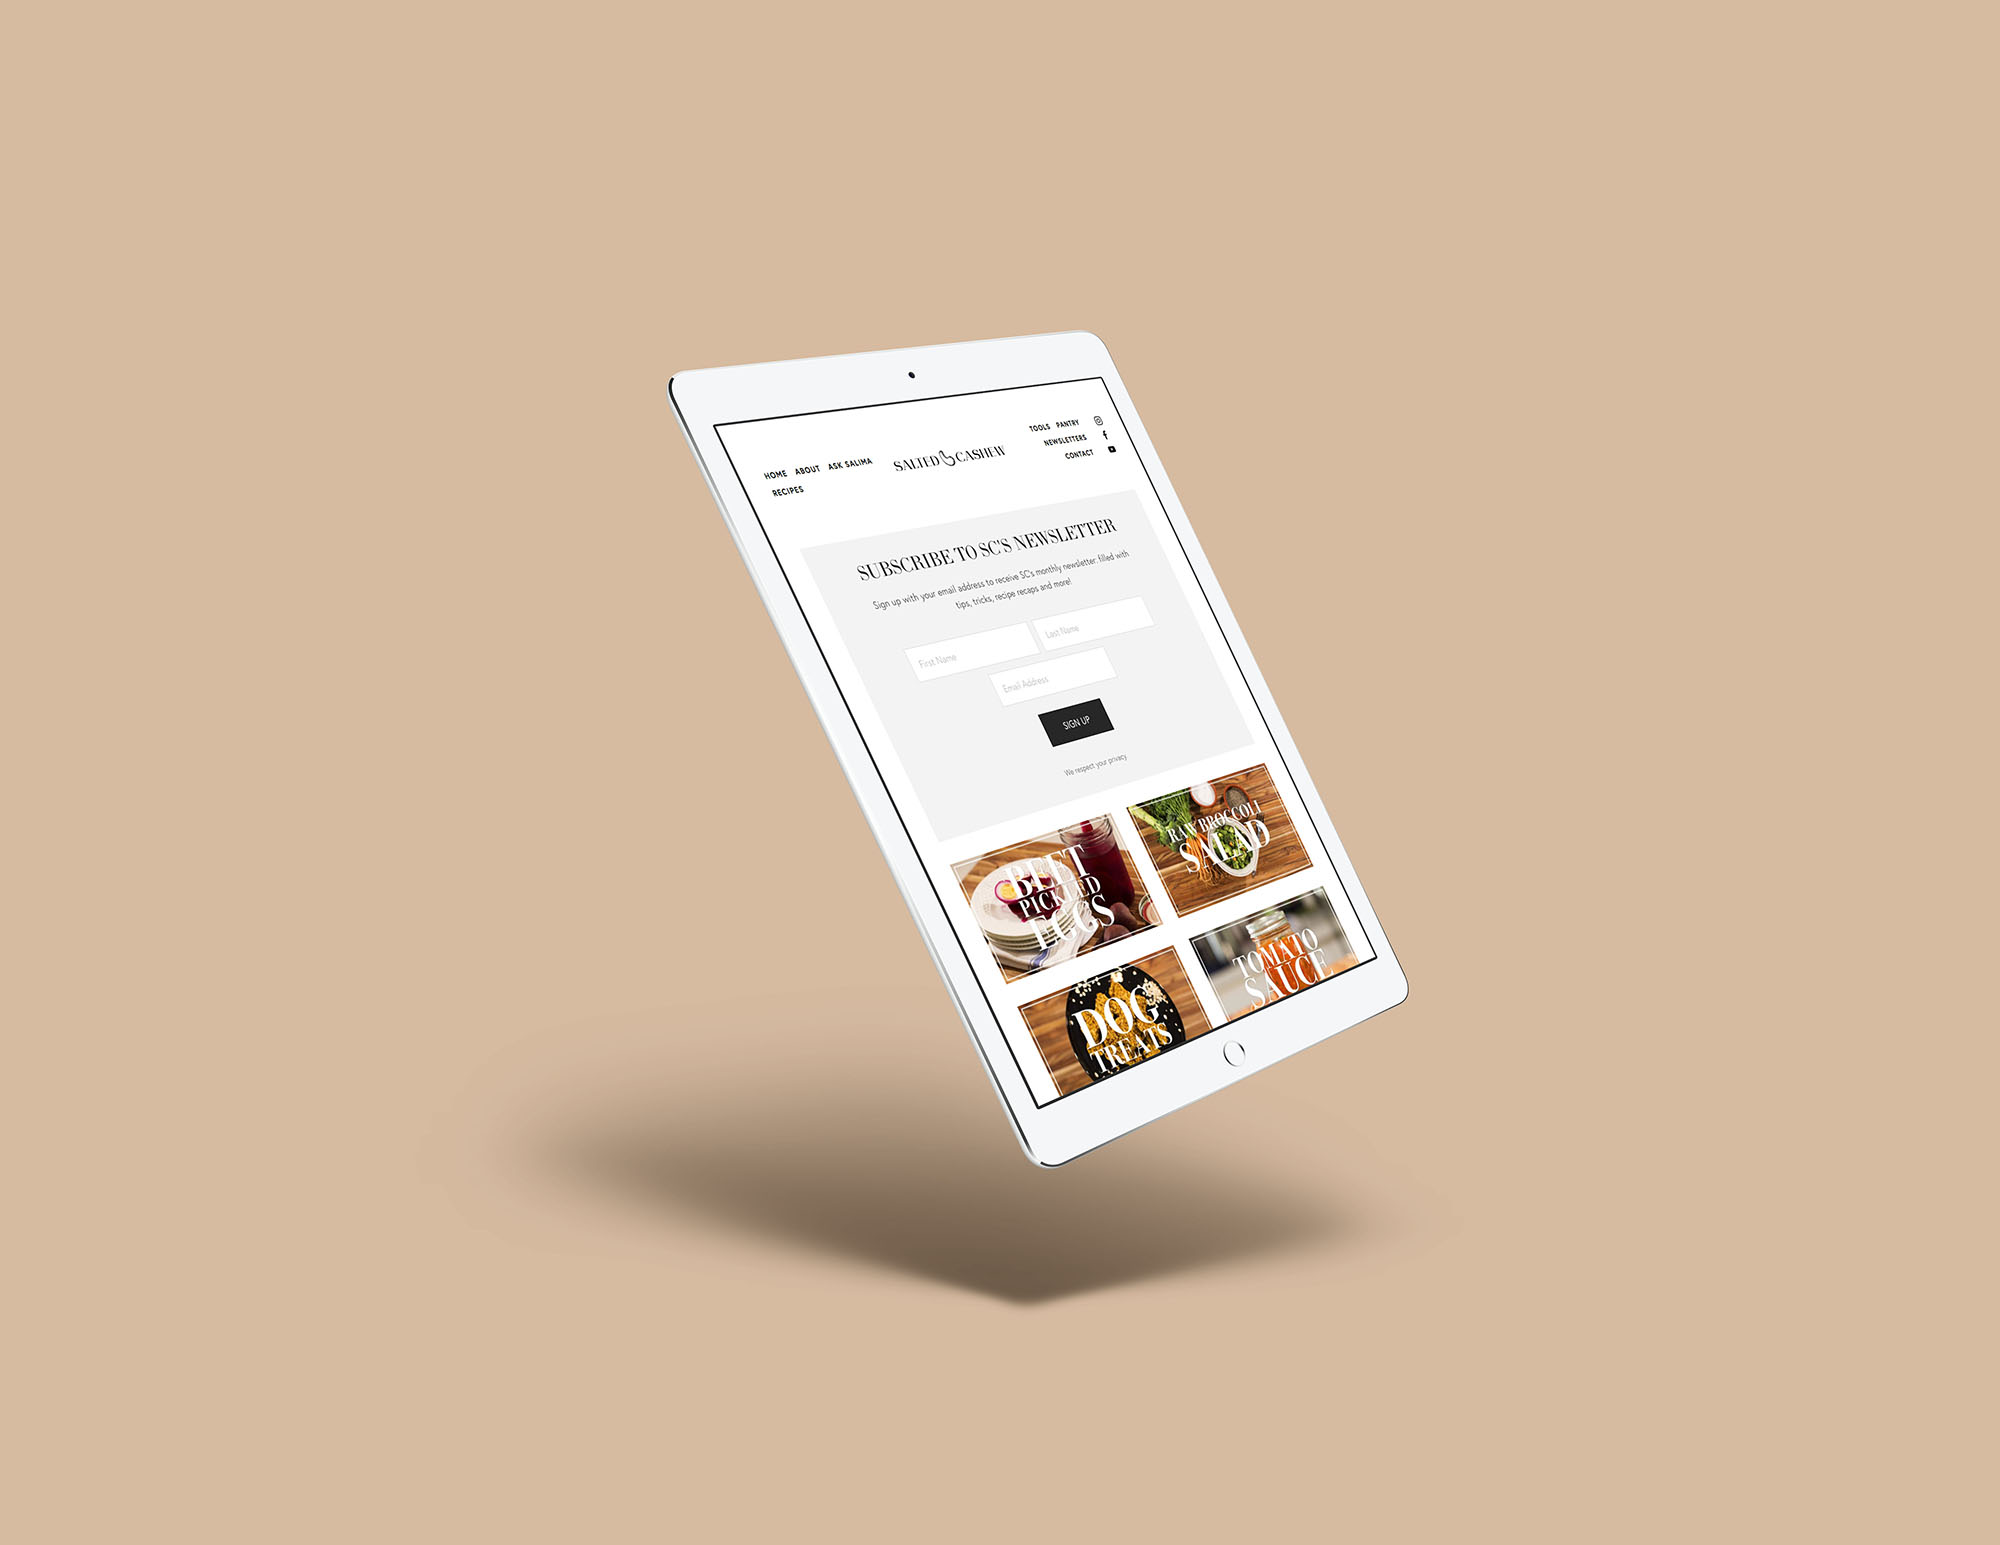 001-iPad-portrait.jpg